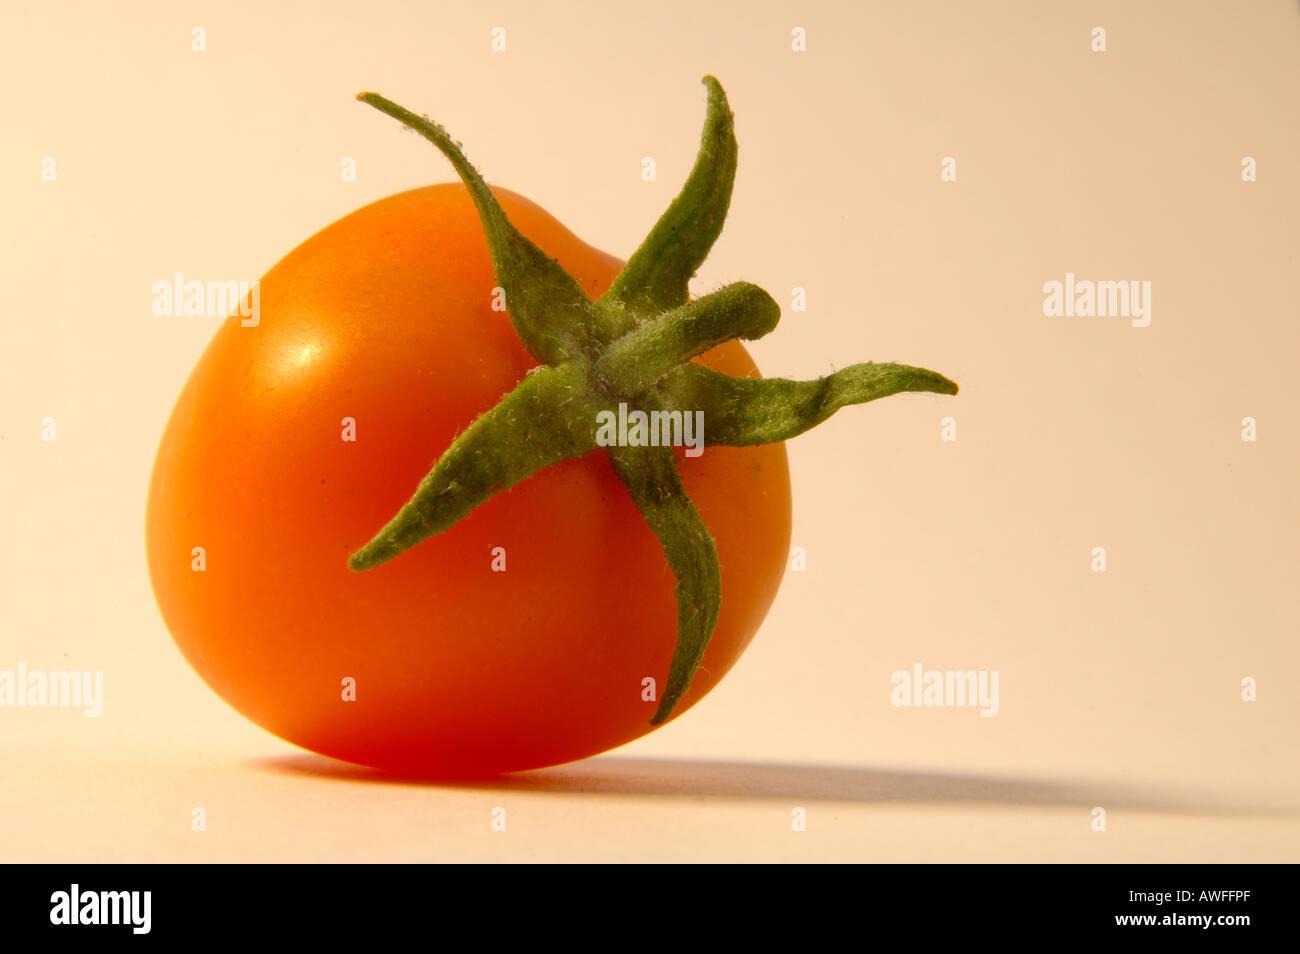 Yellow tomato 2 of 2 - Stock Image